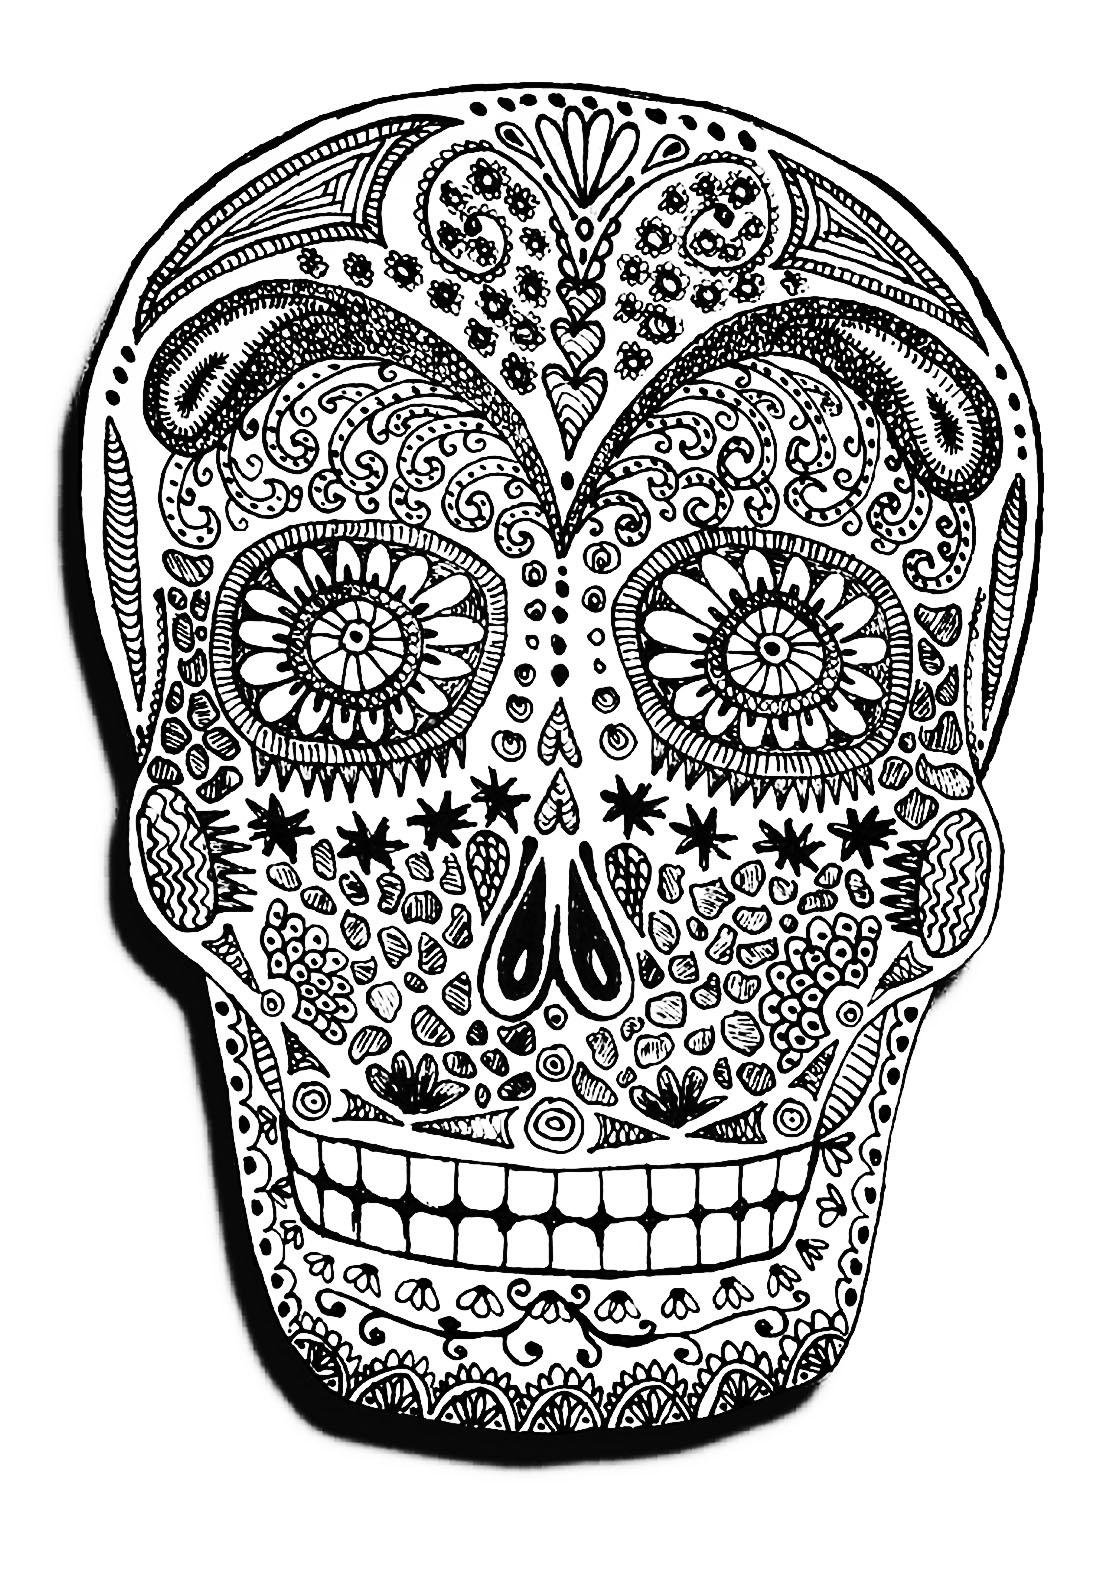 Halloween Skeleton Head Halloween Adult Coloring Pages